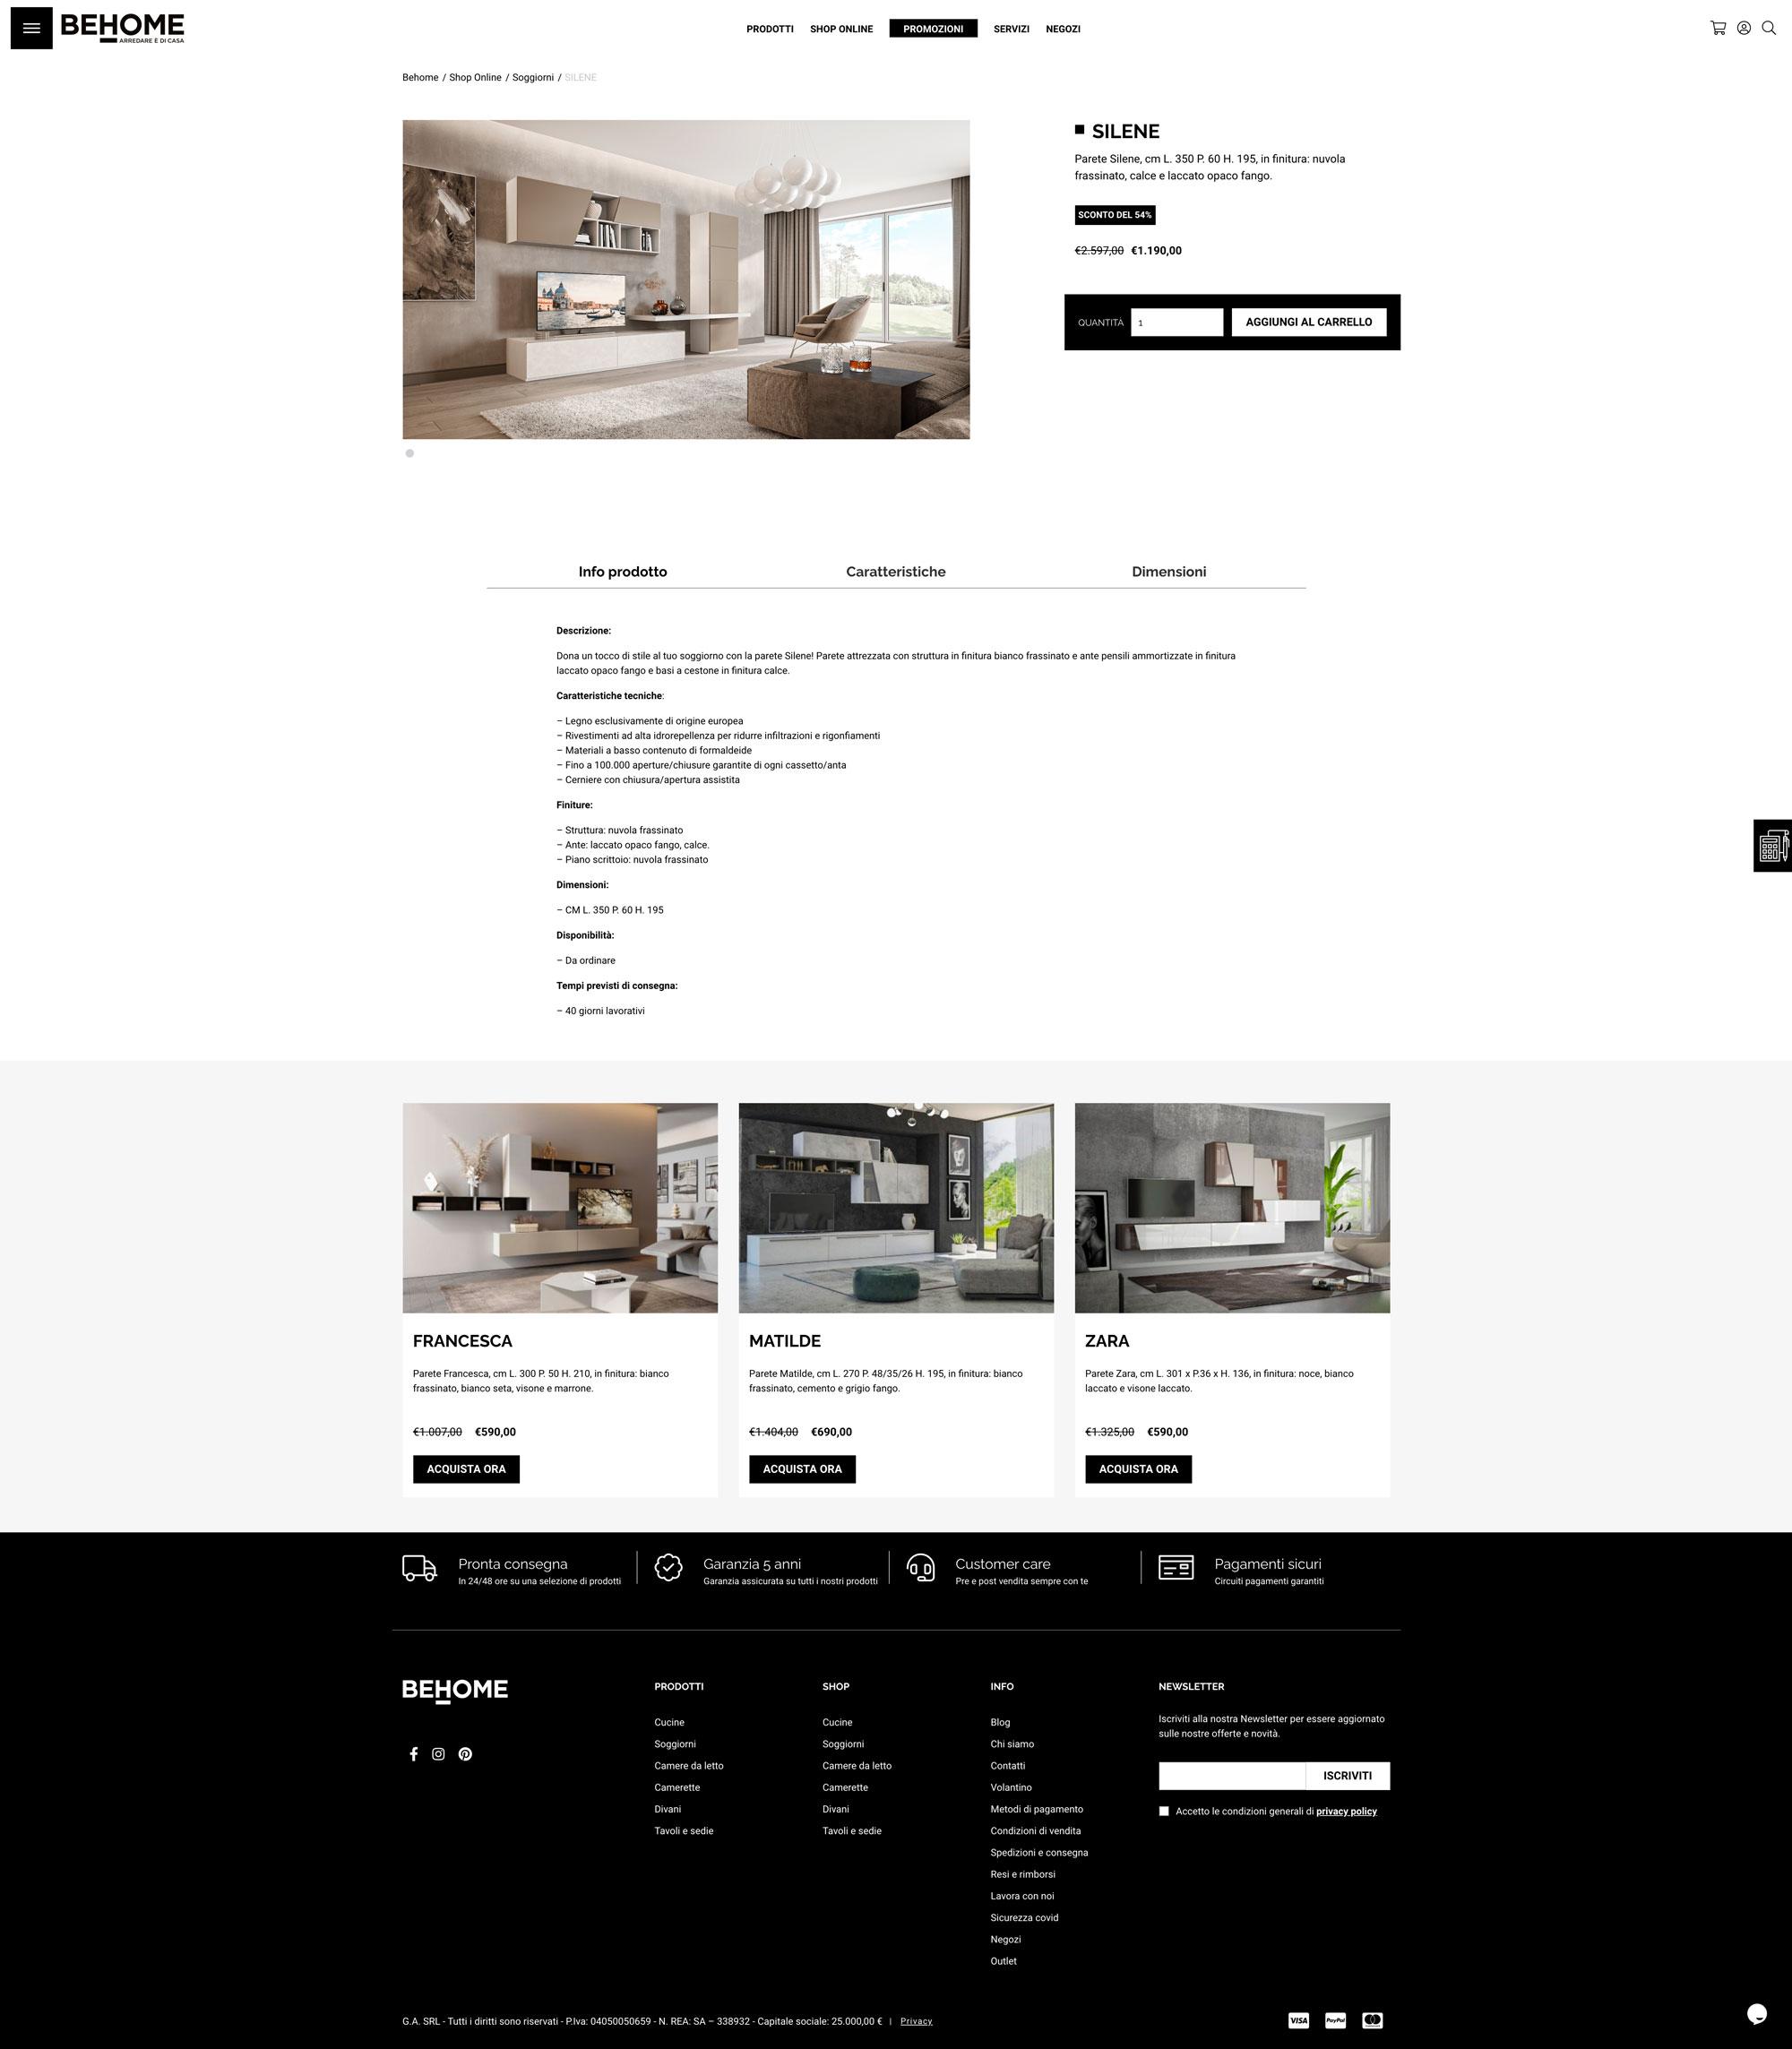 behome_scheda_prodotto_homepage_emmemedia-2